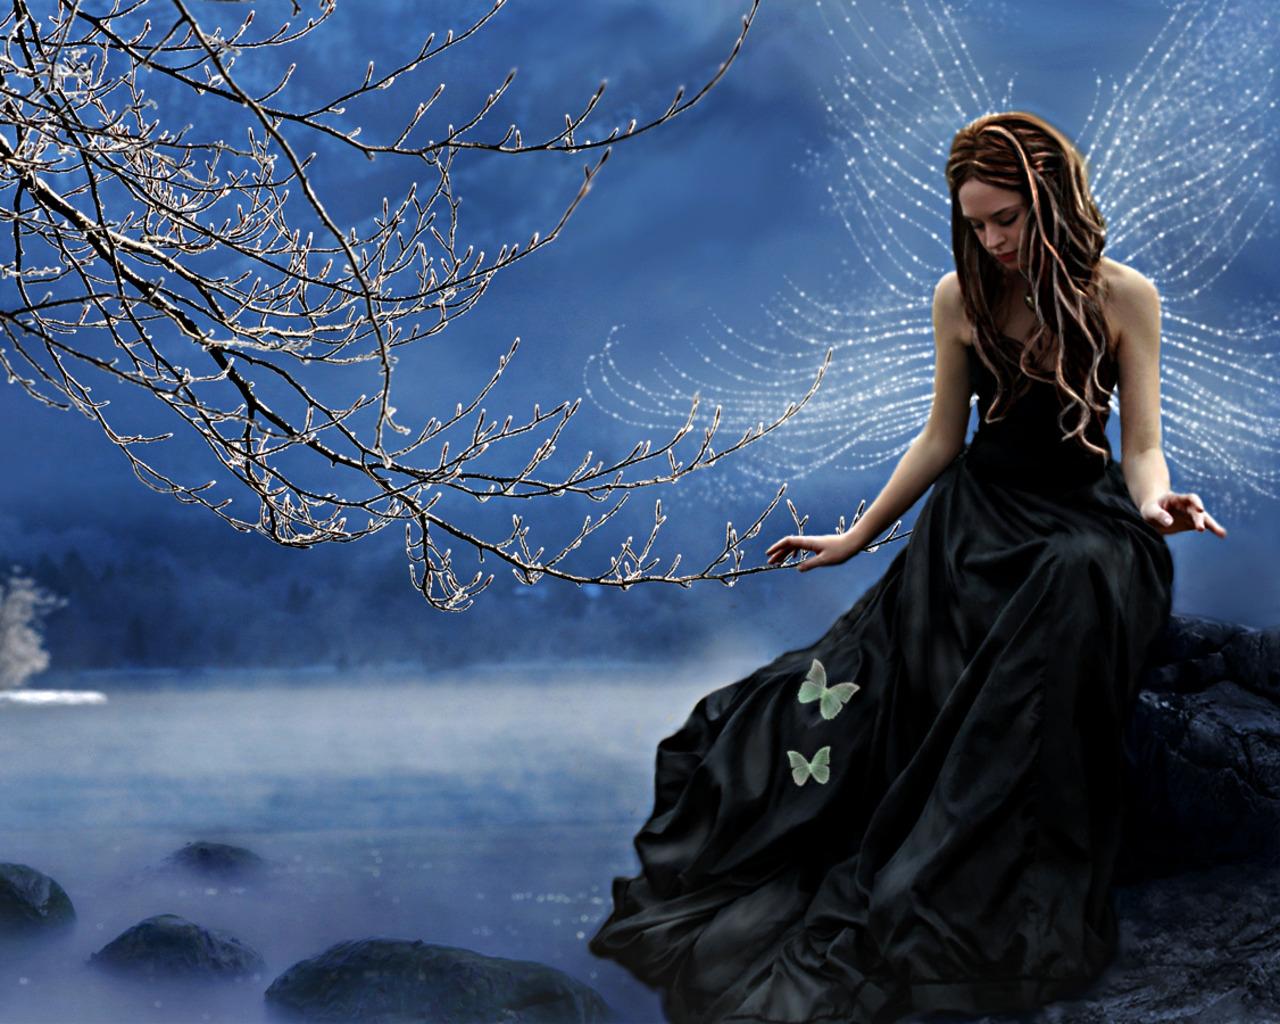 Water Fairy Wallpaper 1280x1024 Water Fairy 1280x1024